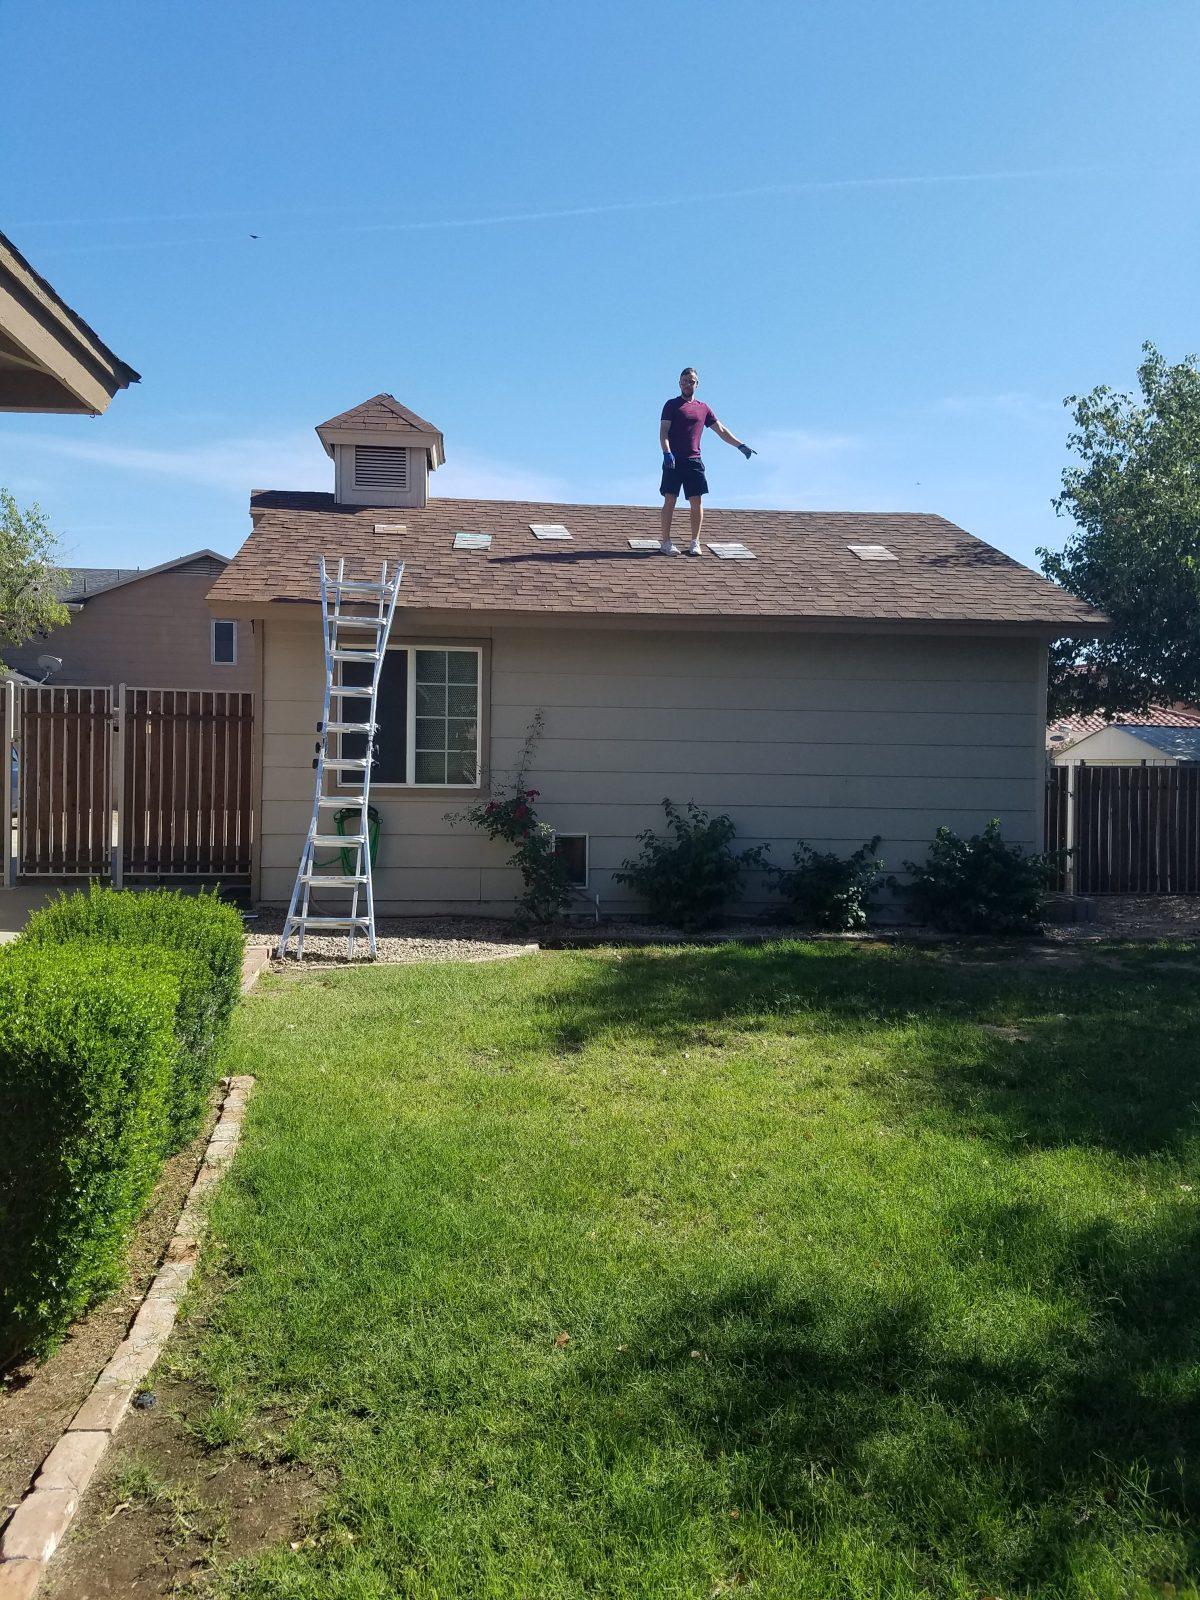 New Roof Options